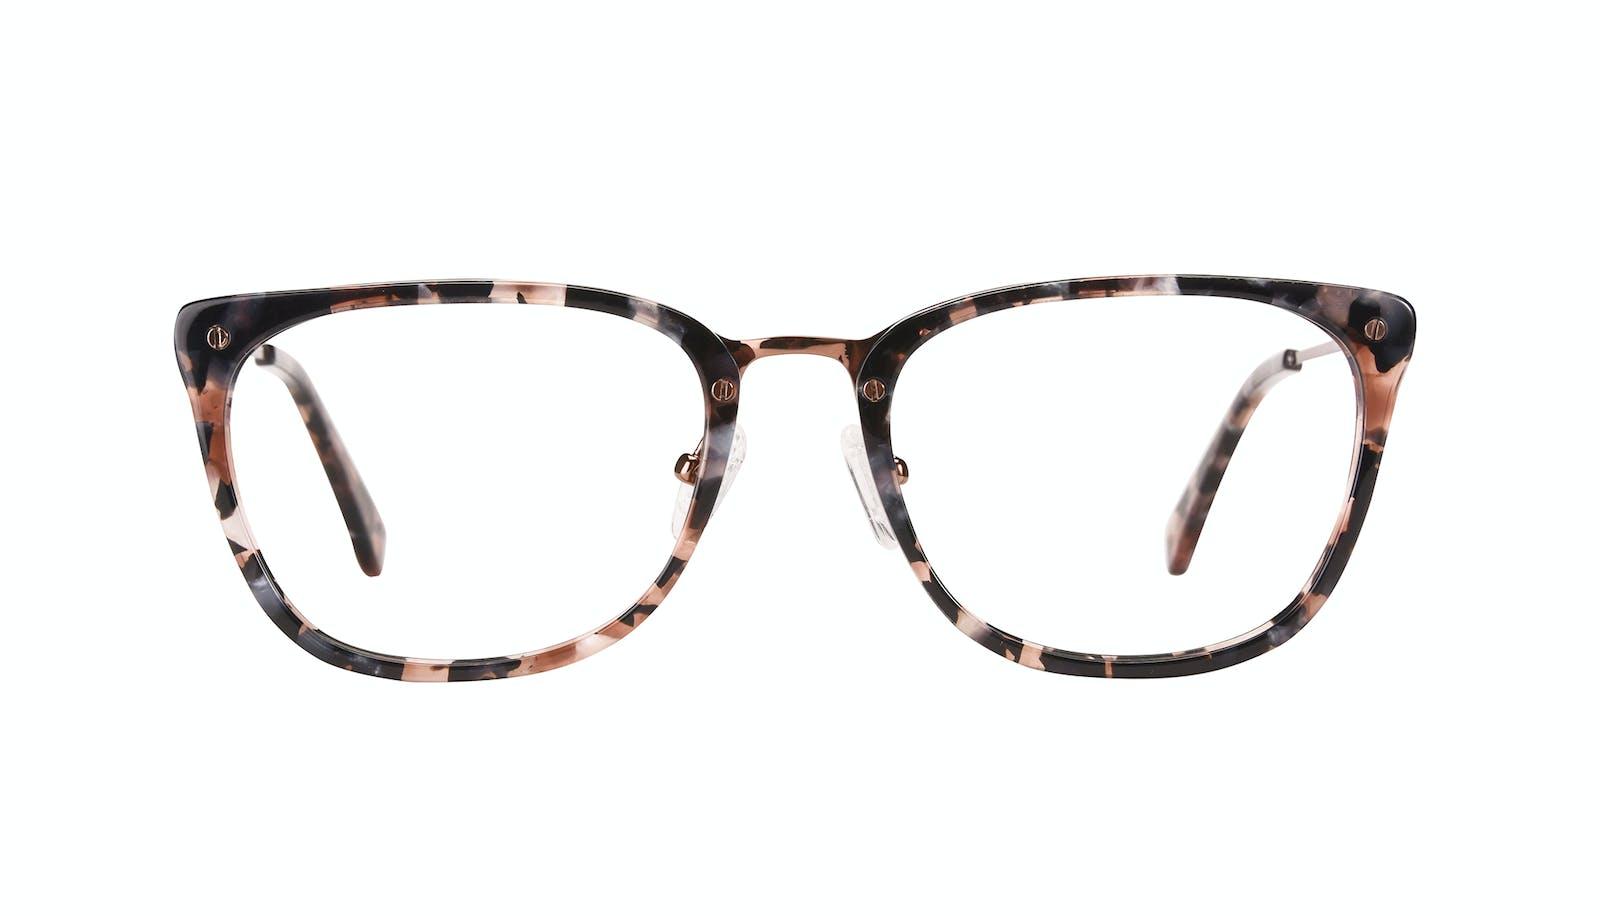 5f2c37e1ed Affordable Fashion Glasses Rectangle Eyeglasses Women Wonder Pink Flake